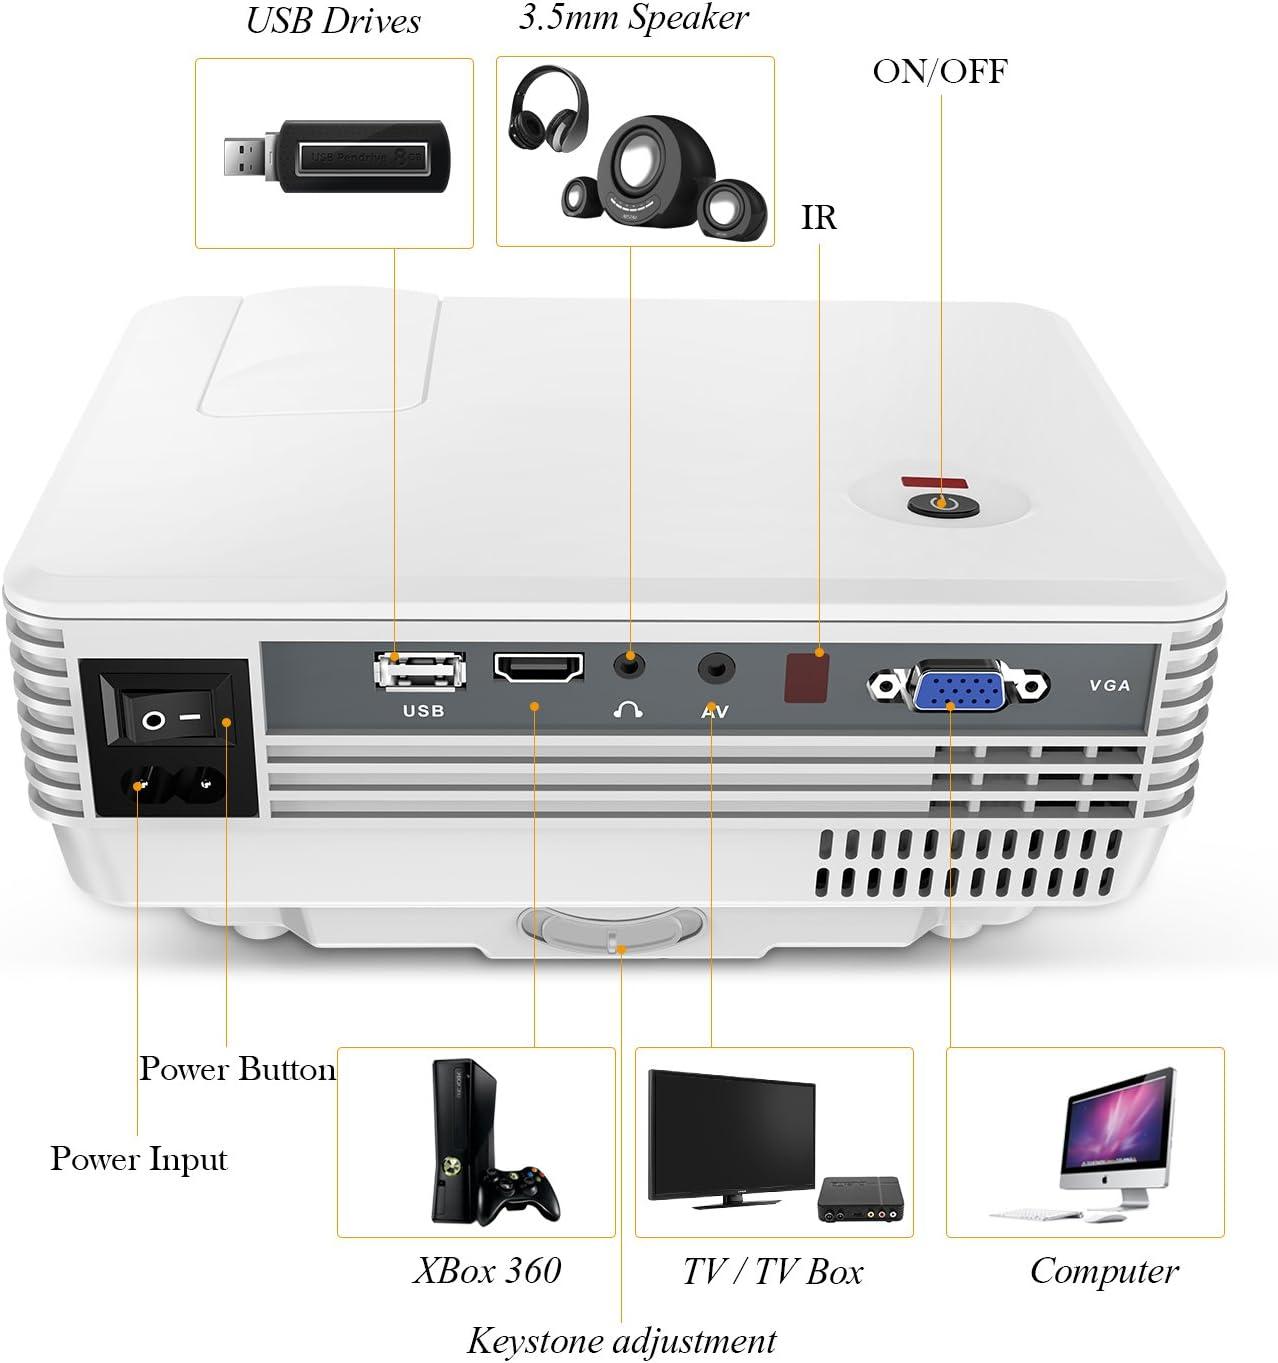 TENKER rd805 LCD Mini Projector Blanco Blanco: Amazon.es: Informática